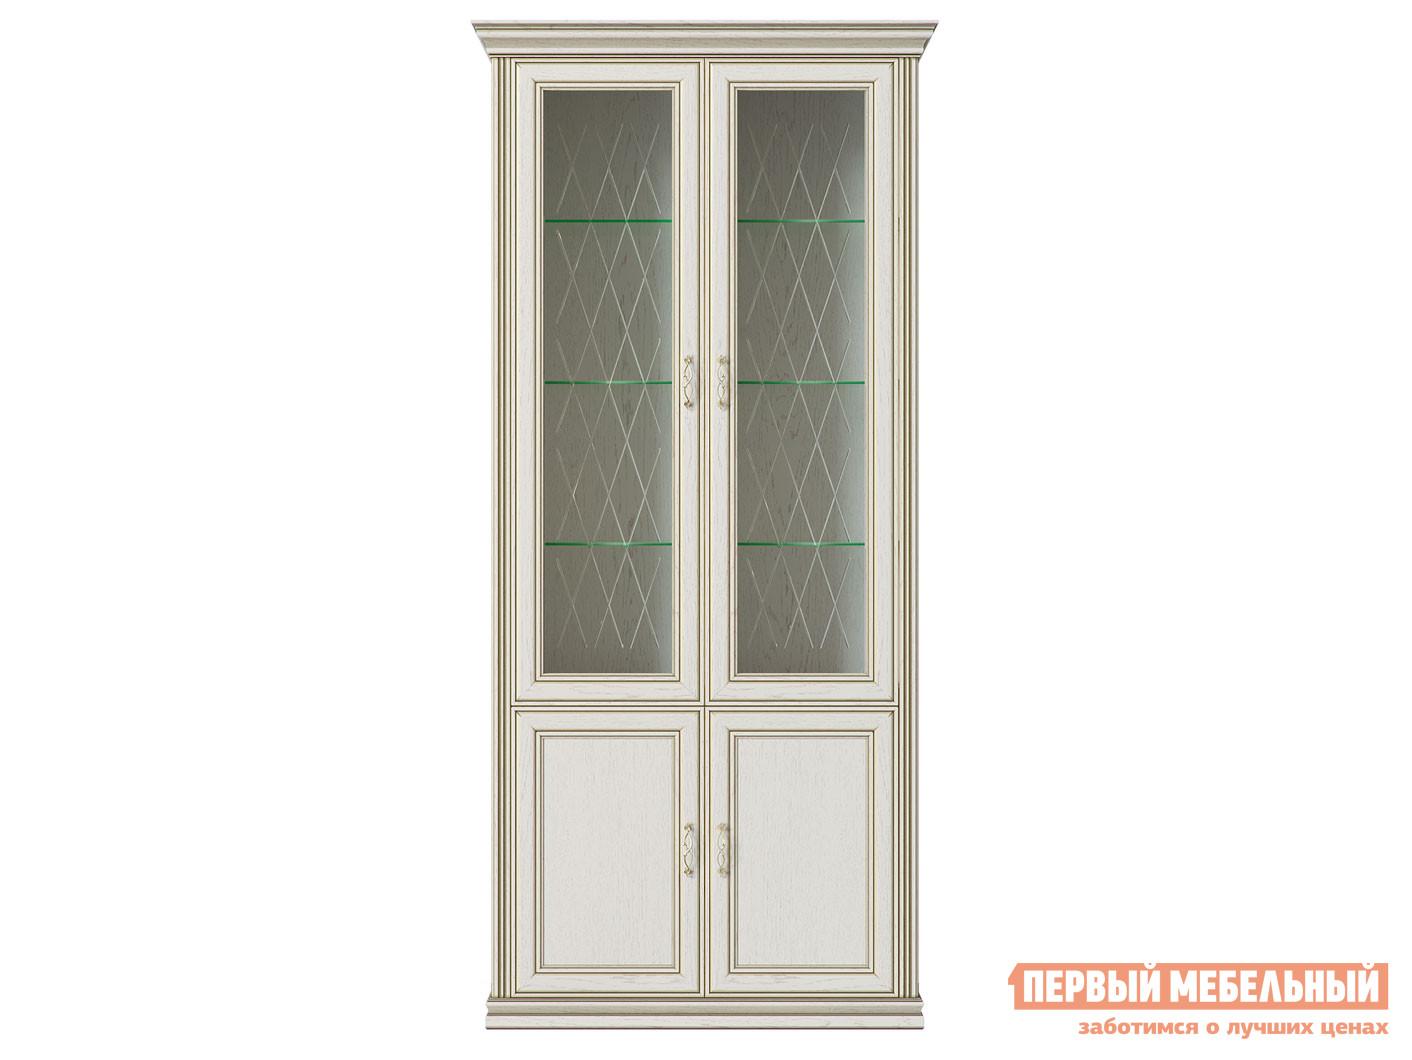 Шкаф-витрина  Шкаф 4-х дверный (2 стеклодвери) Венето Дуб молочный